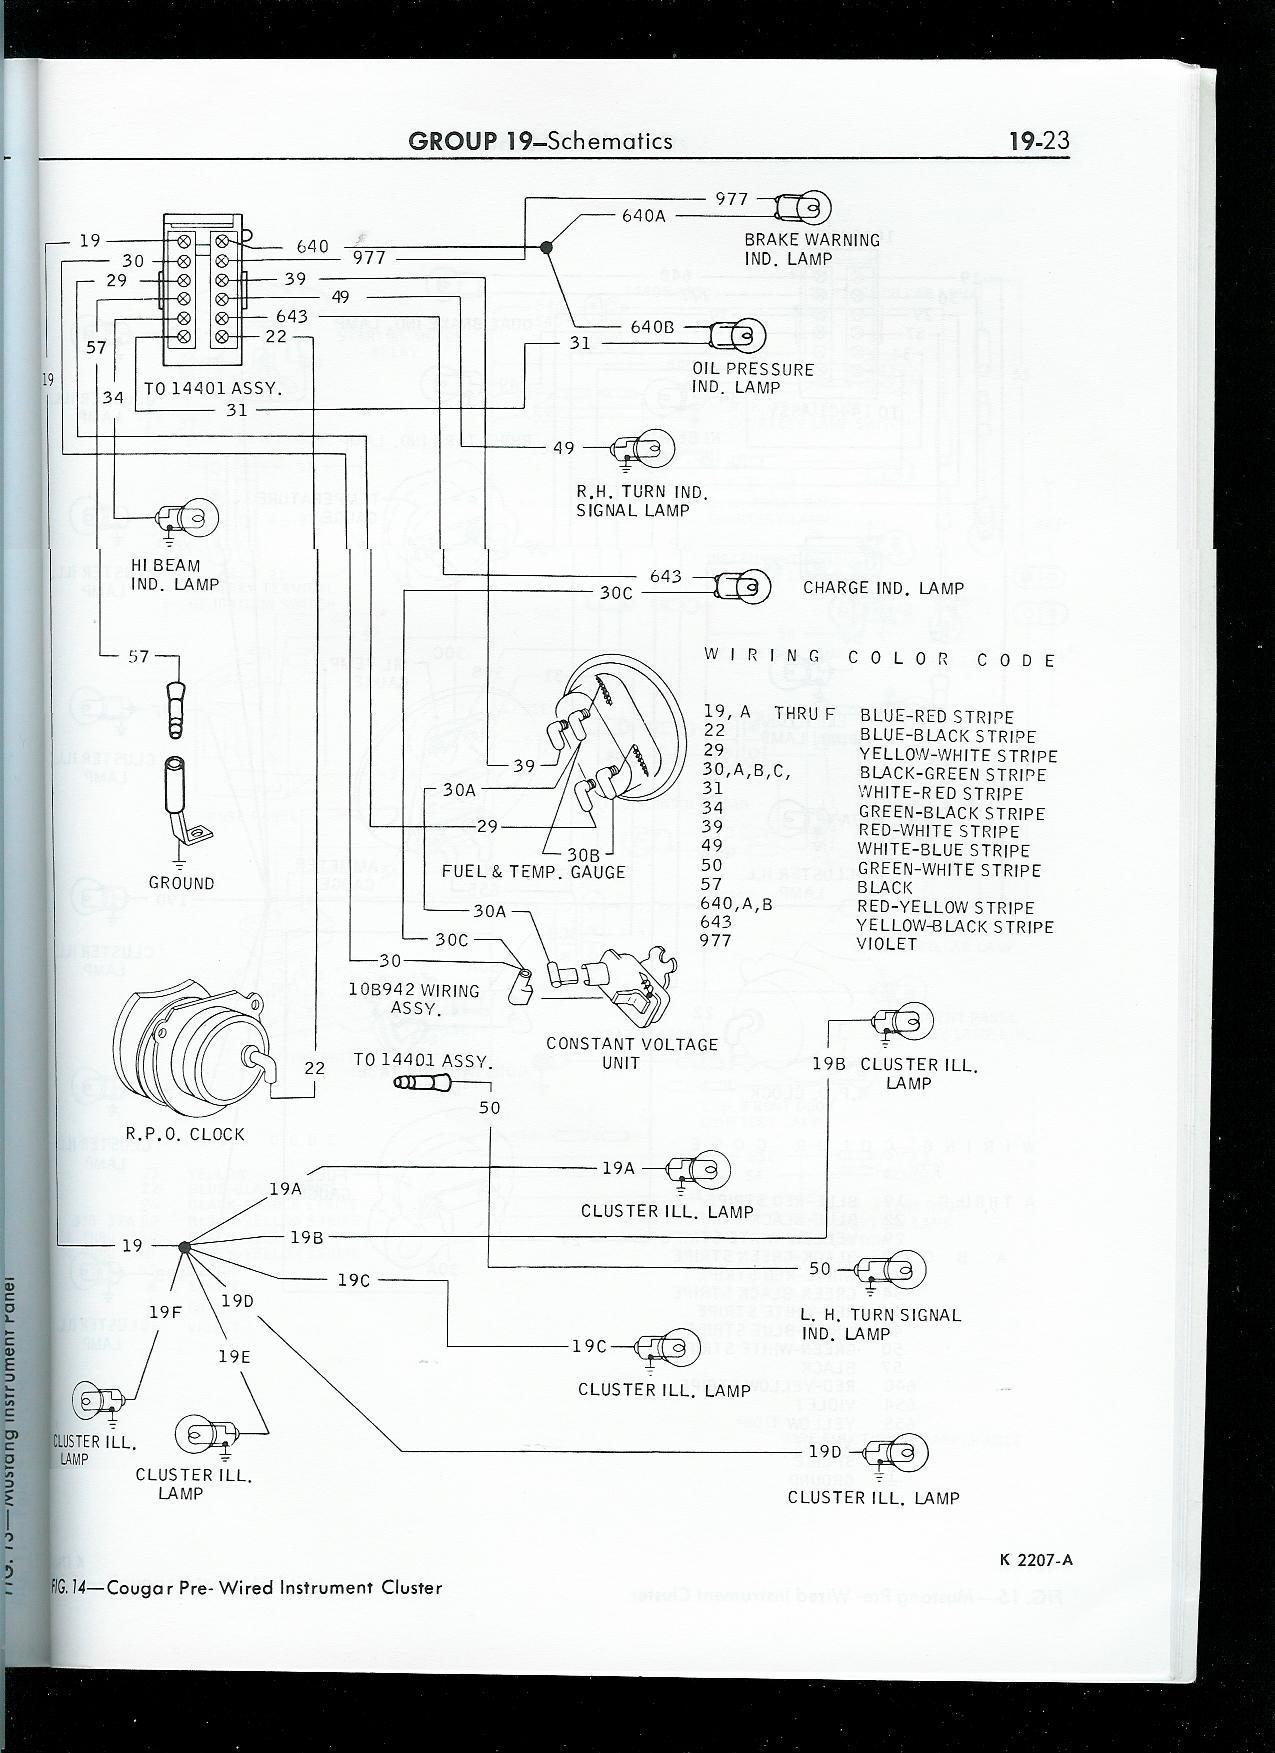 1968 mustang fuel gauge wiring diagram - wiring diagram school-teta-b -  school-teta-b.disnar.it  disnar.it